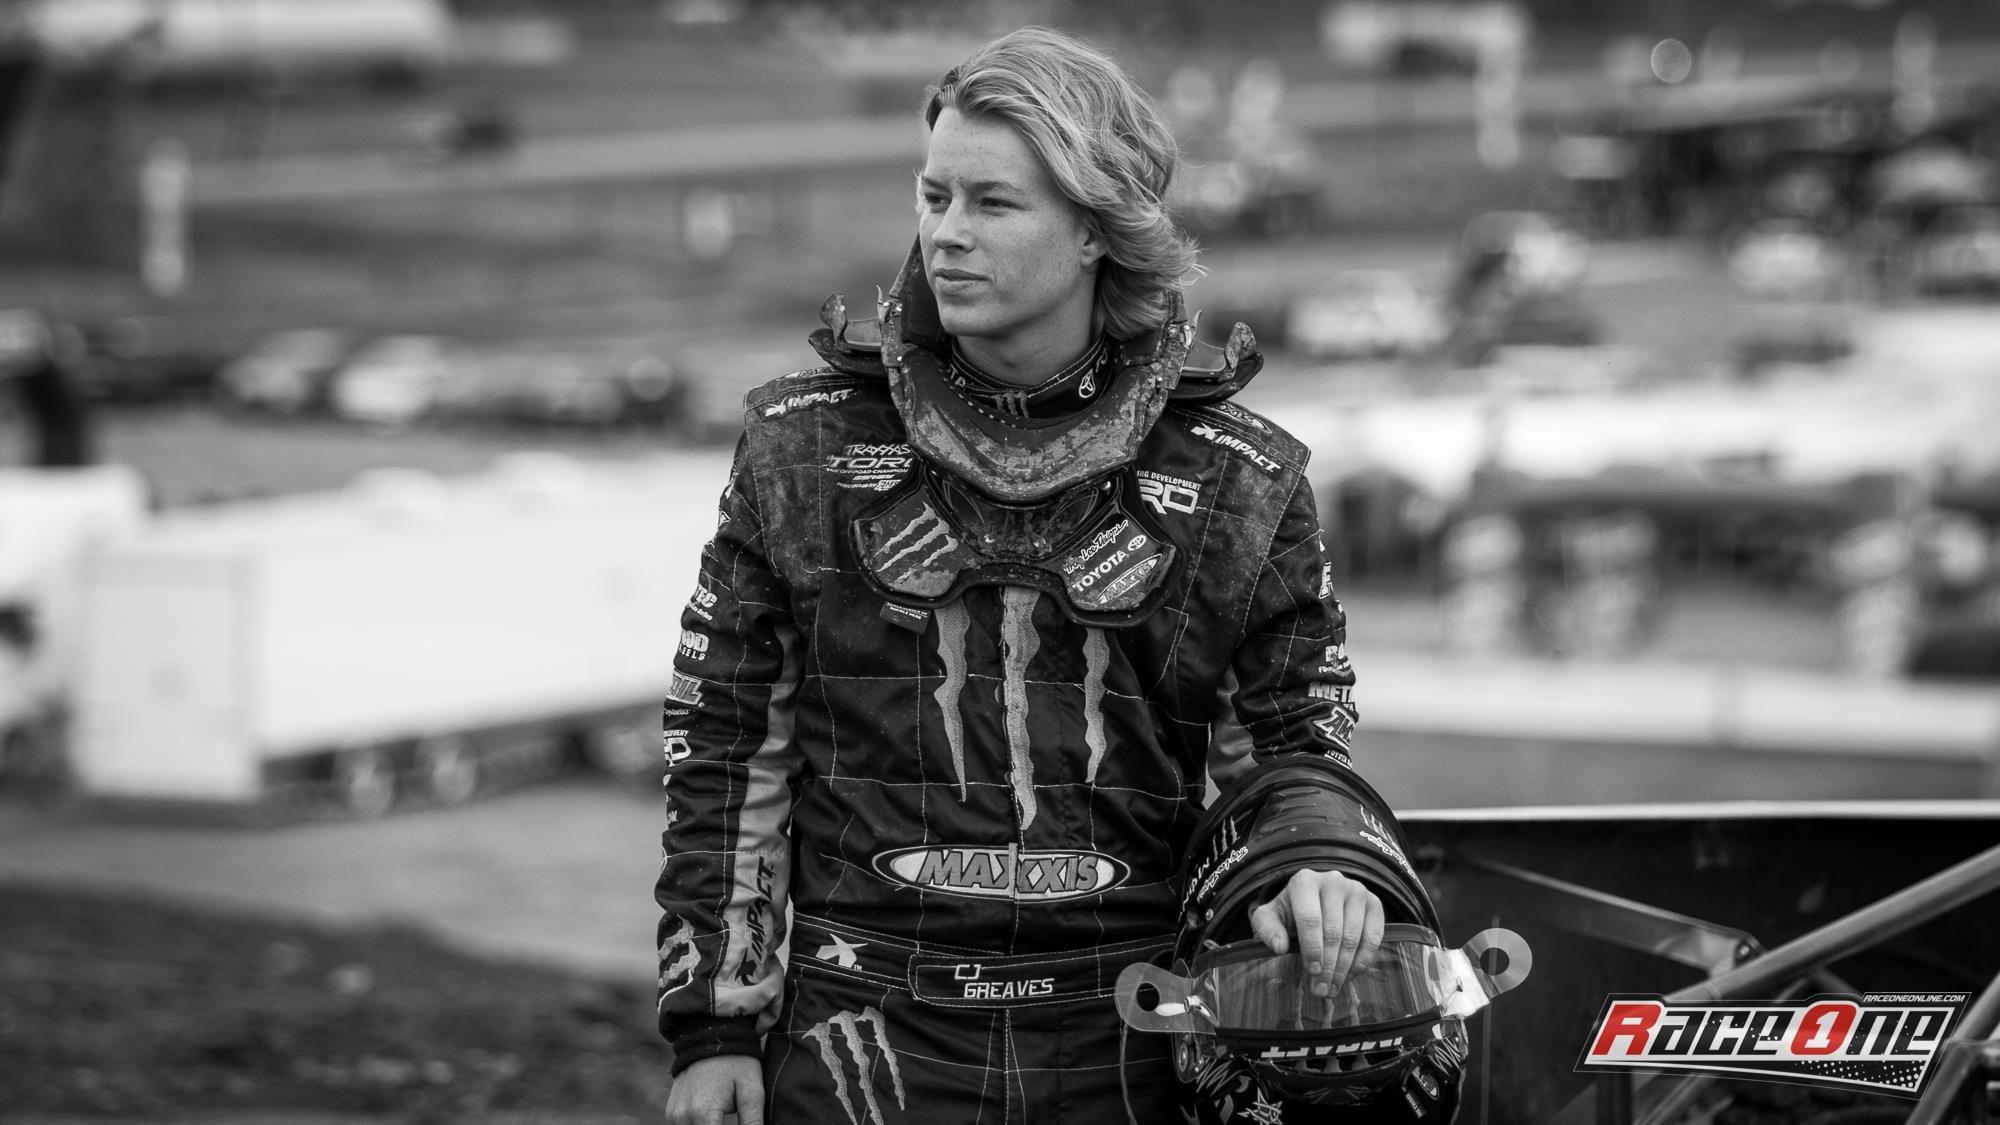 CJ Greaves Off road racing, Road racing, Racing